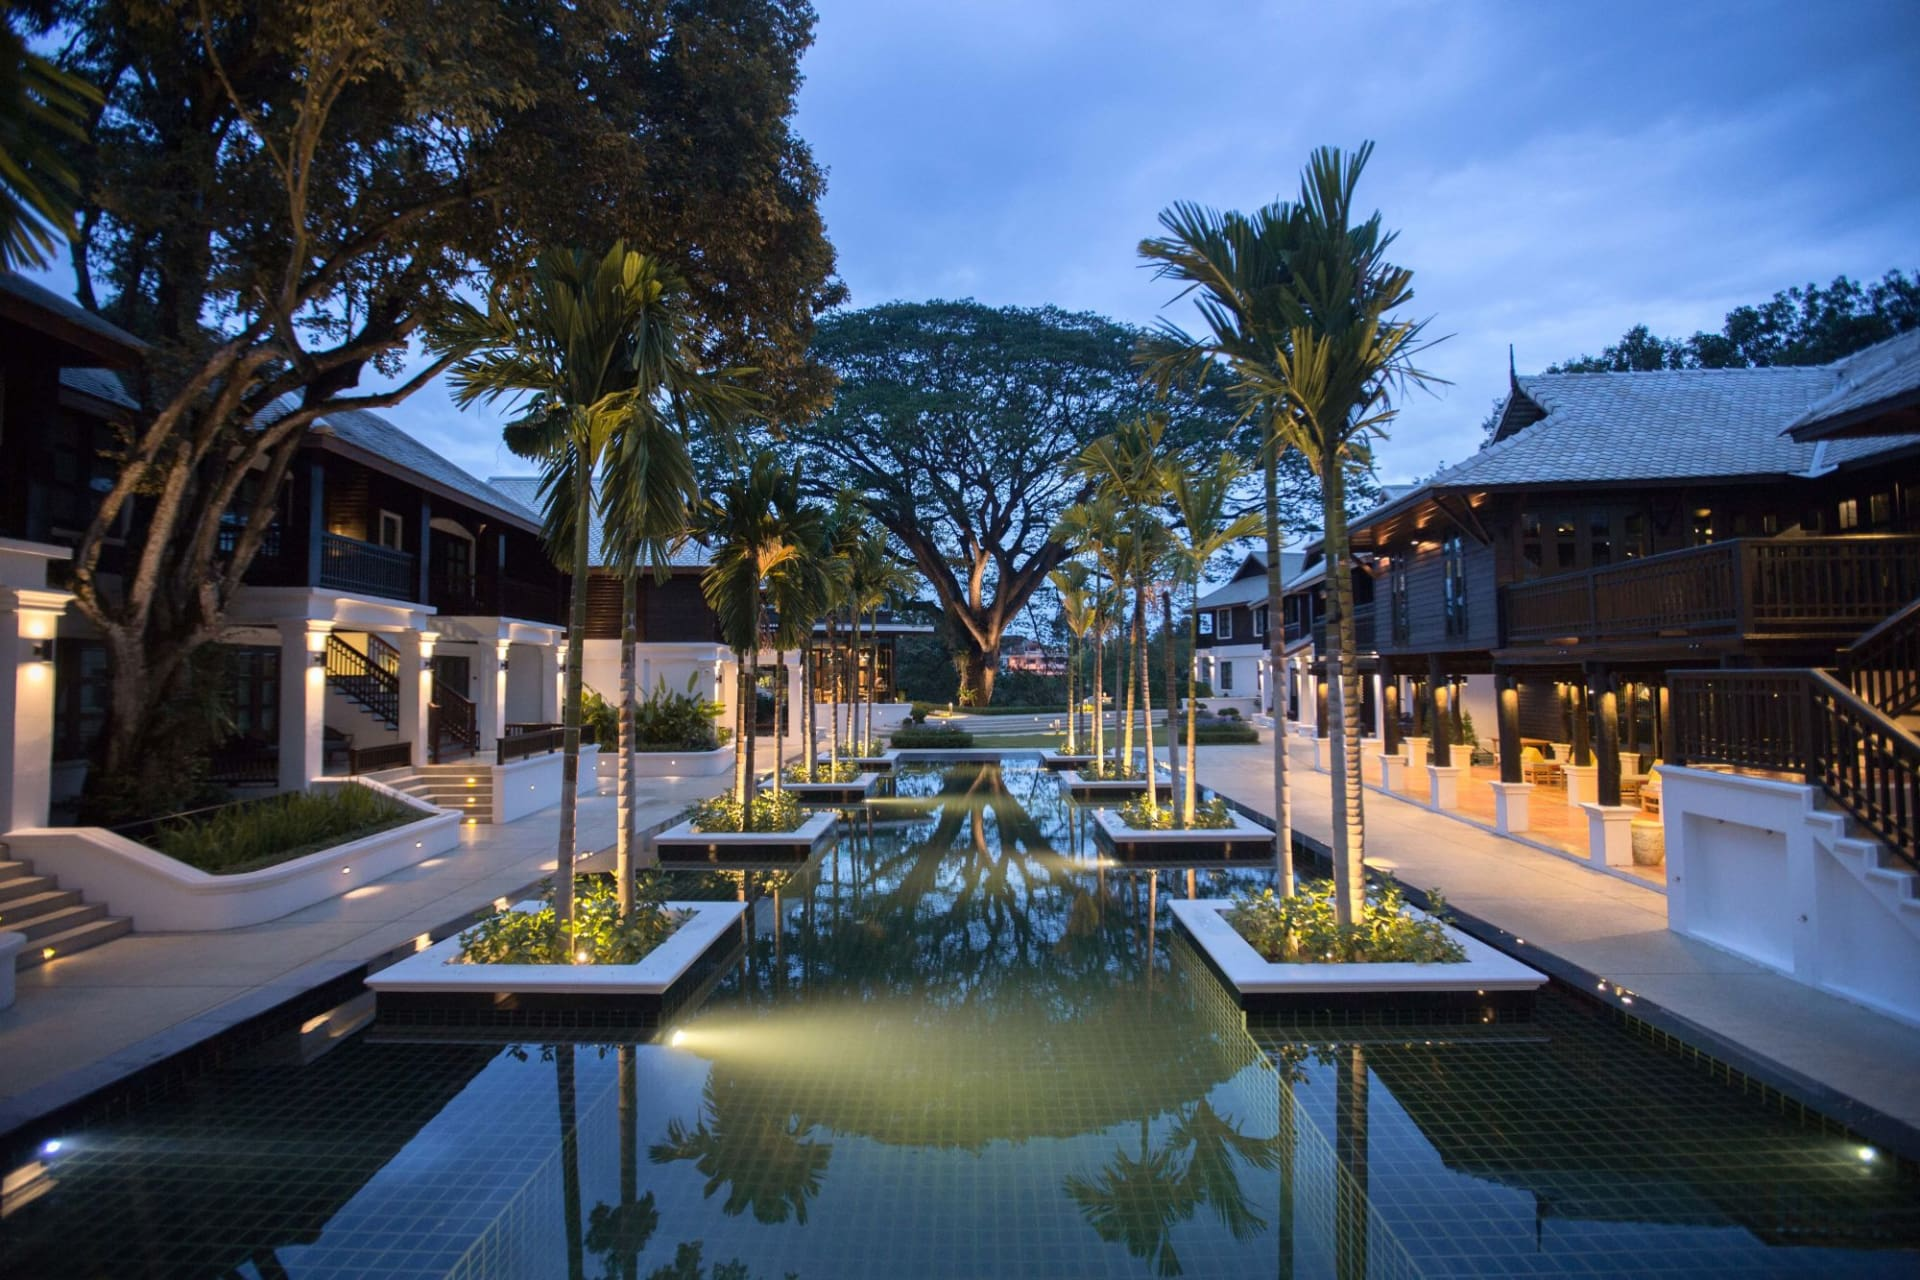 facilities: Na Nirand Romantic Boutique Resort